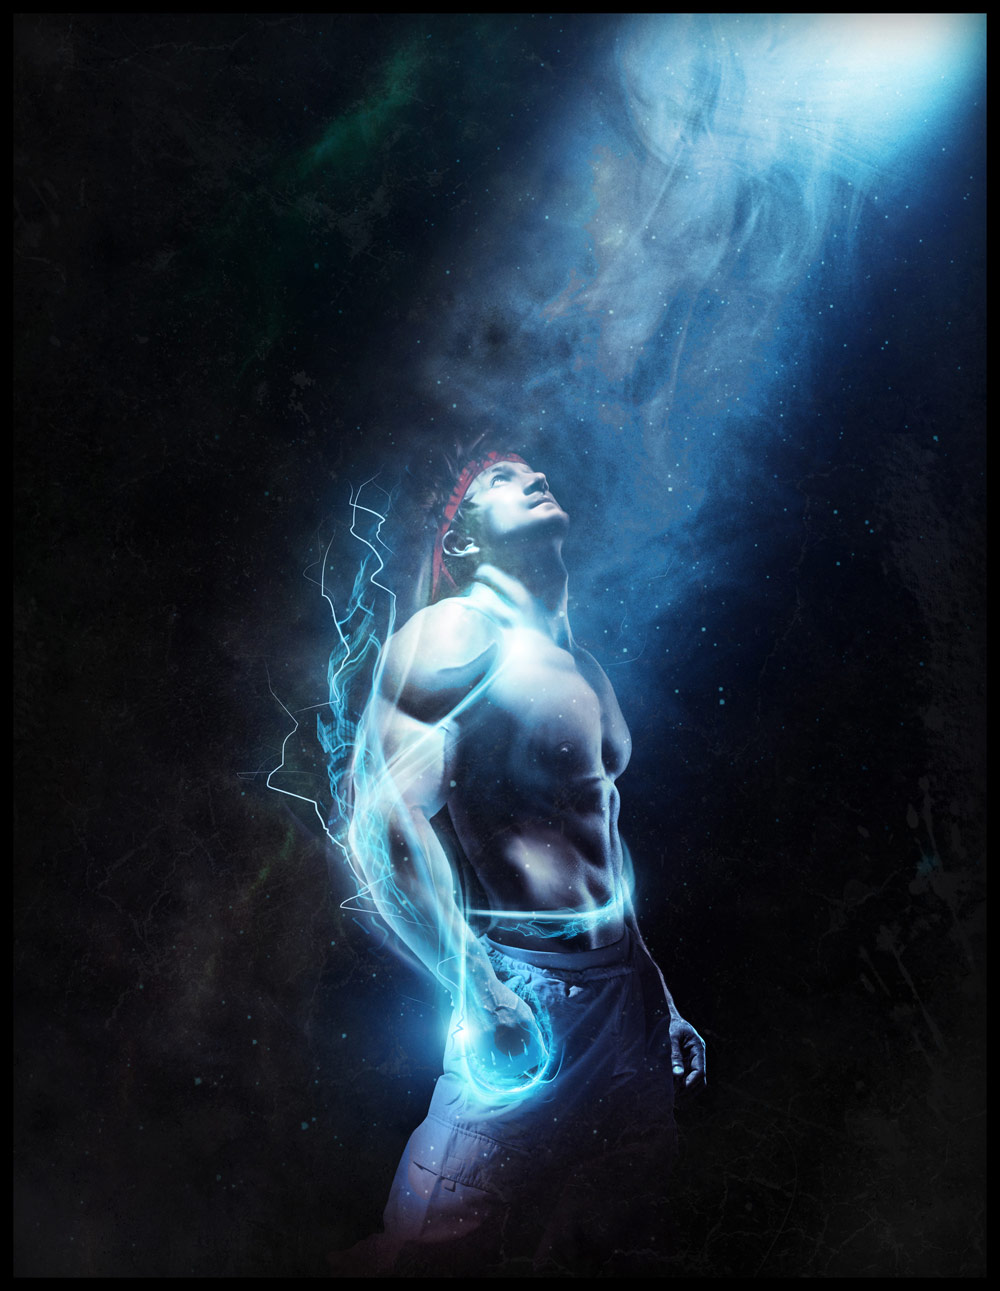 Ryu hyper real Street Fighter art